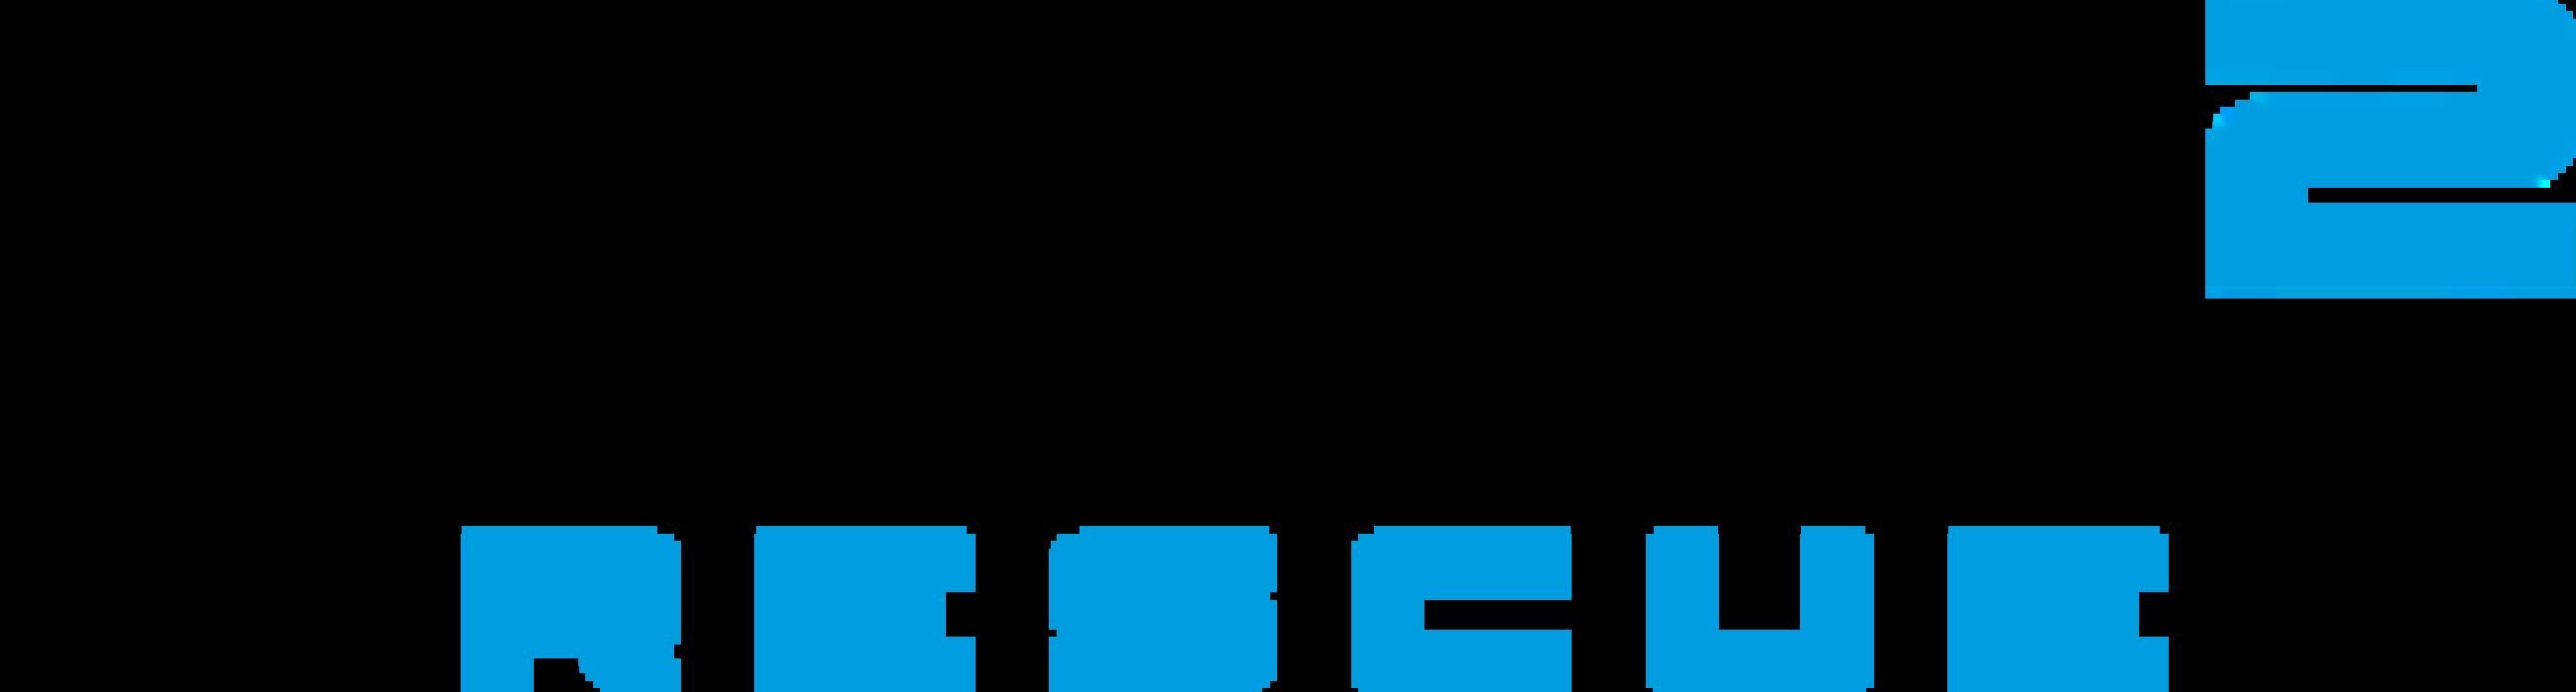 SIM2 Rsc Logo alt